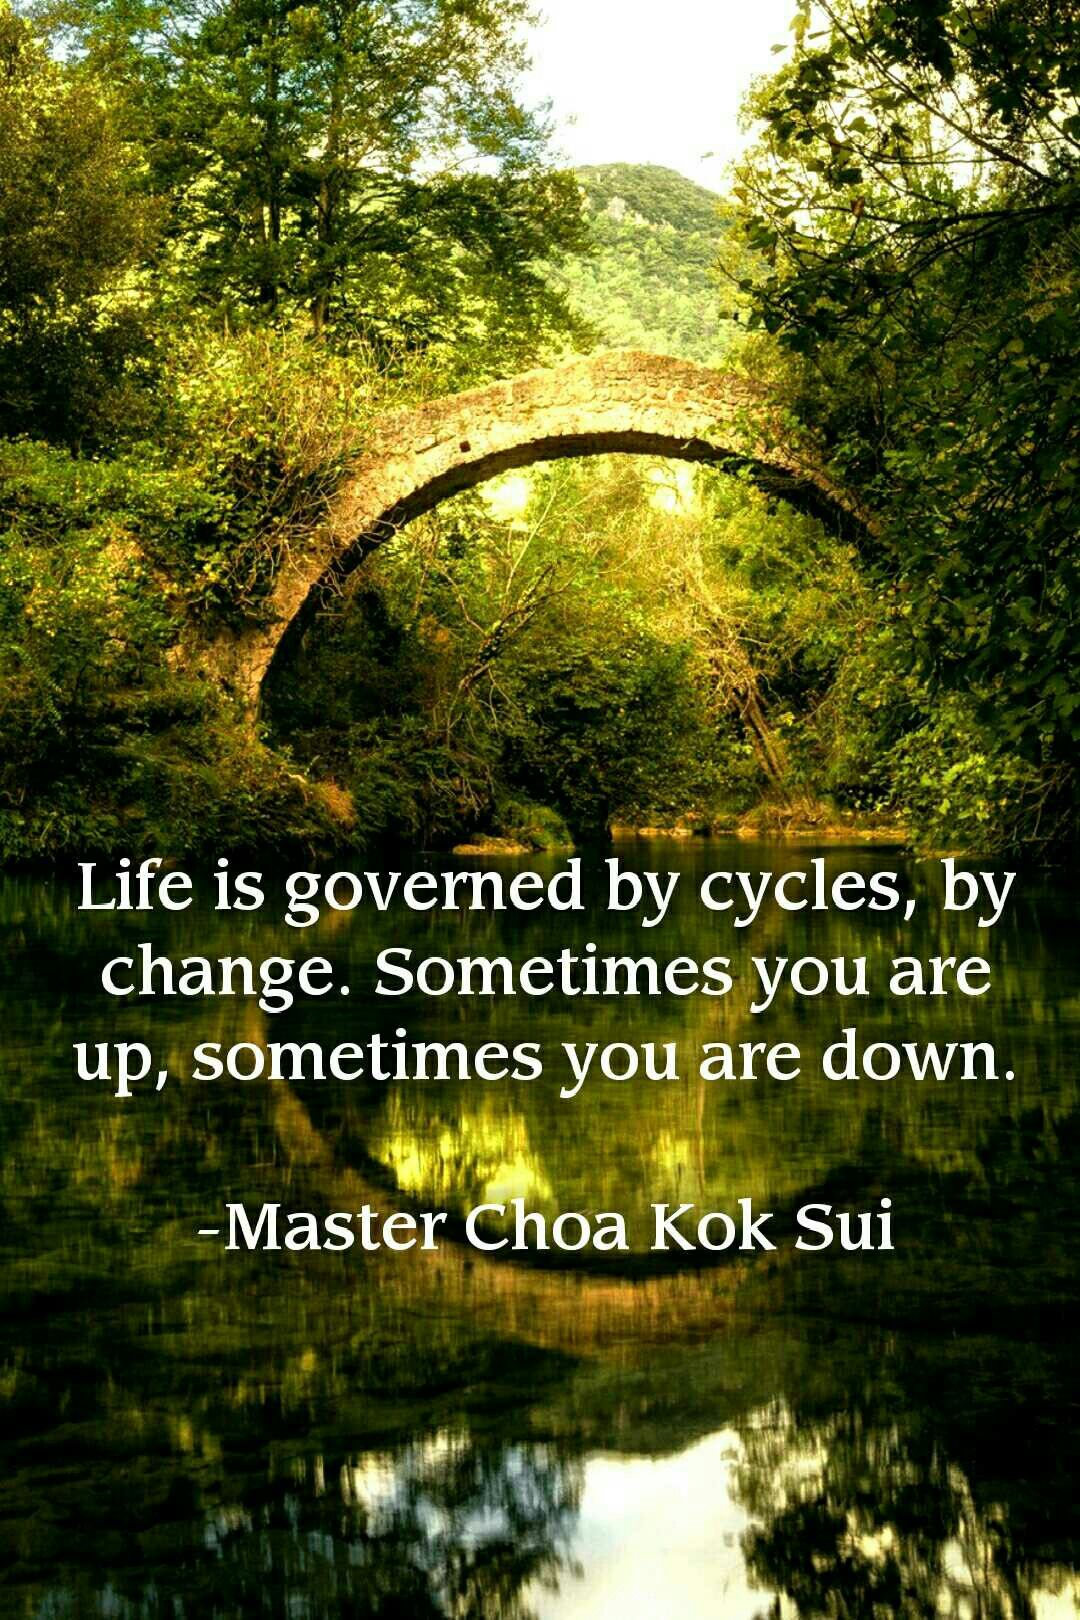 Wisdom Quotes Quotes Unfoldapp Mcks Life Cycles Quotes Life